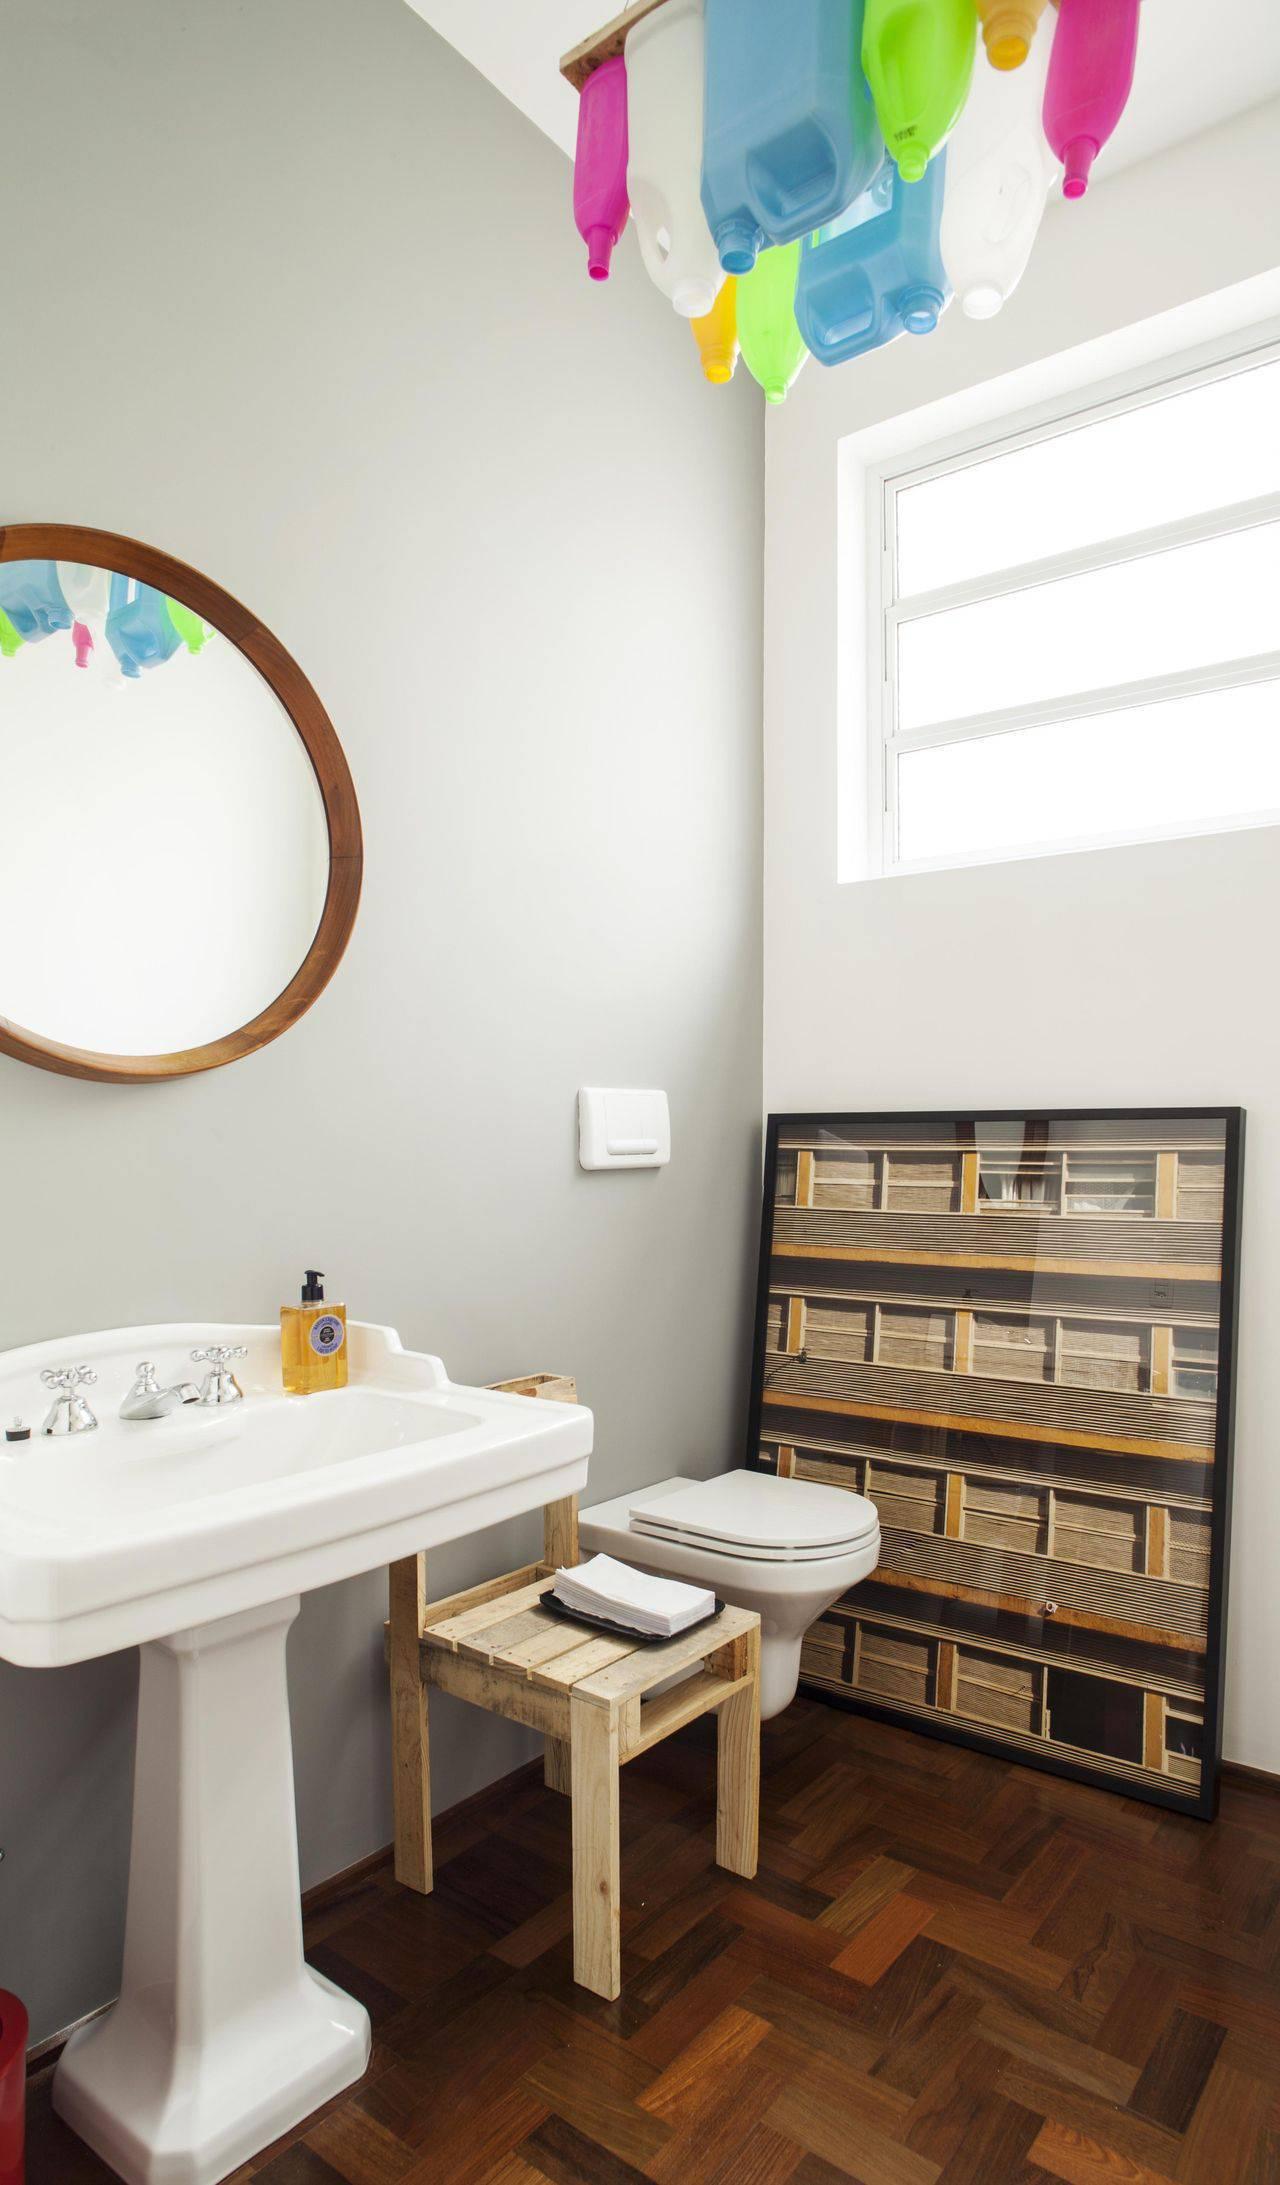 vaso sanitario banheiro mauricio arruda 110120